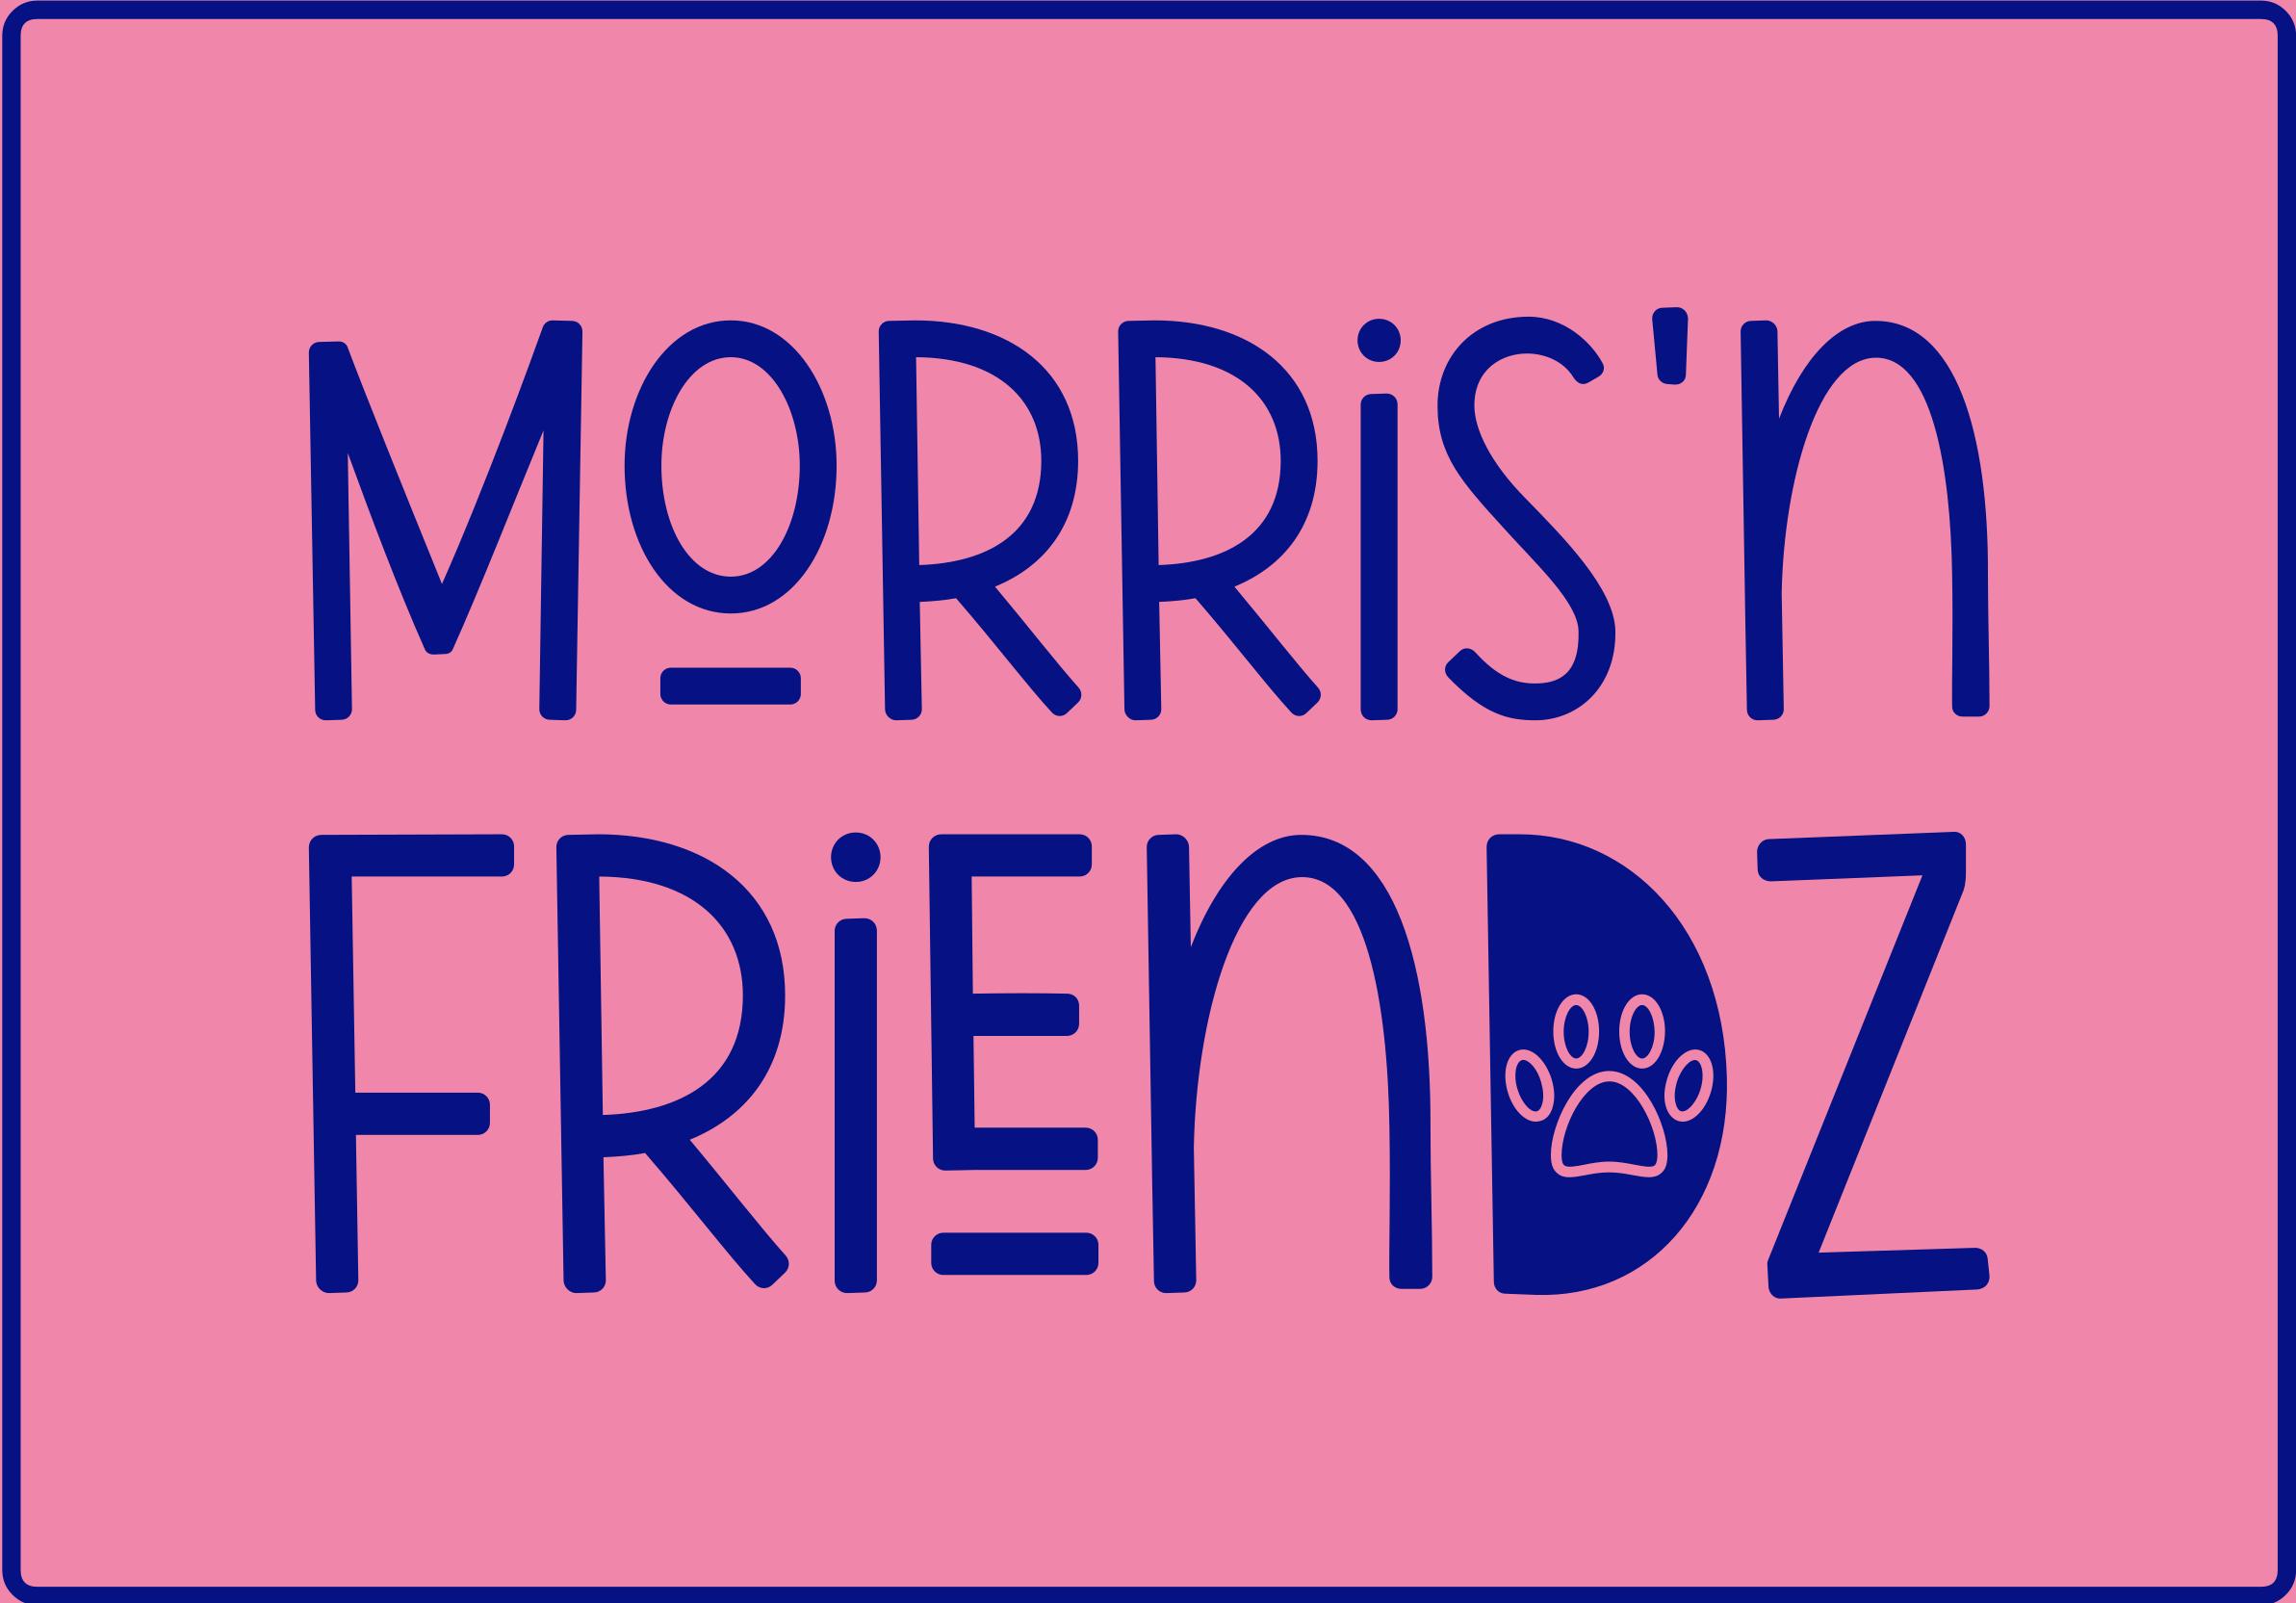 Morrisn friendz